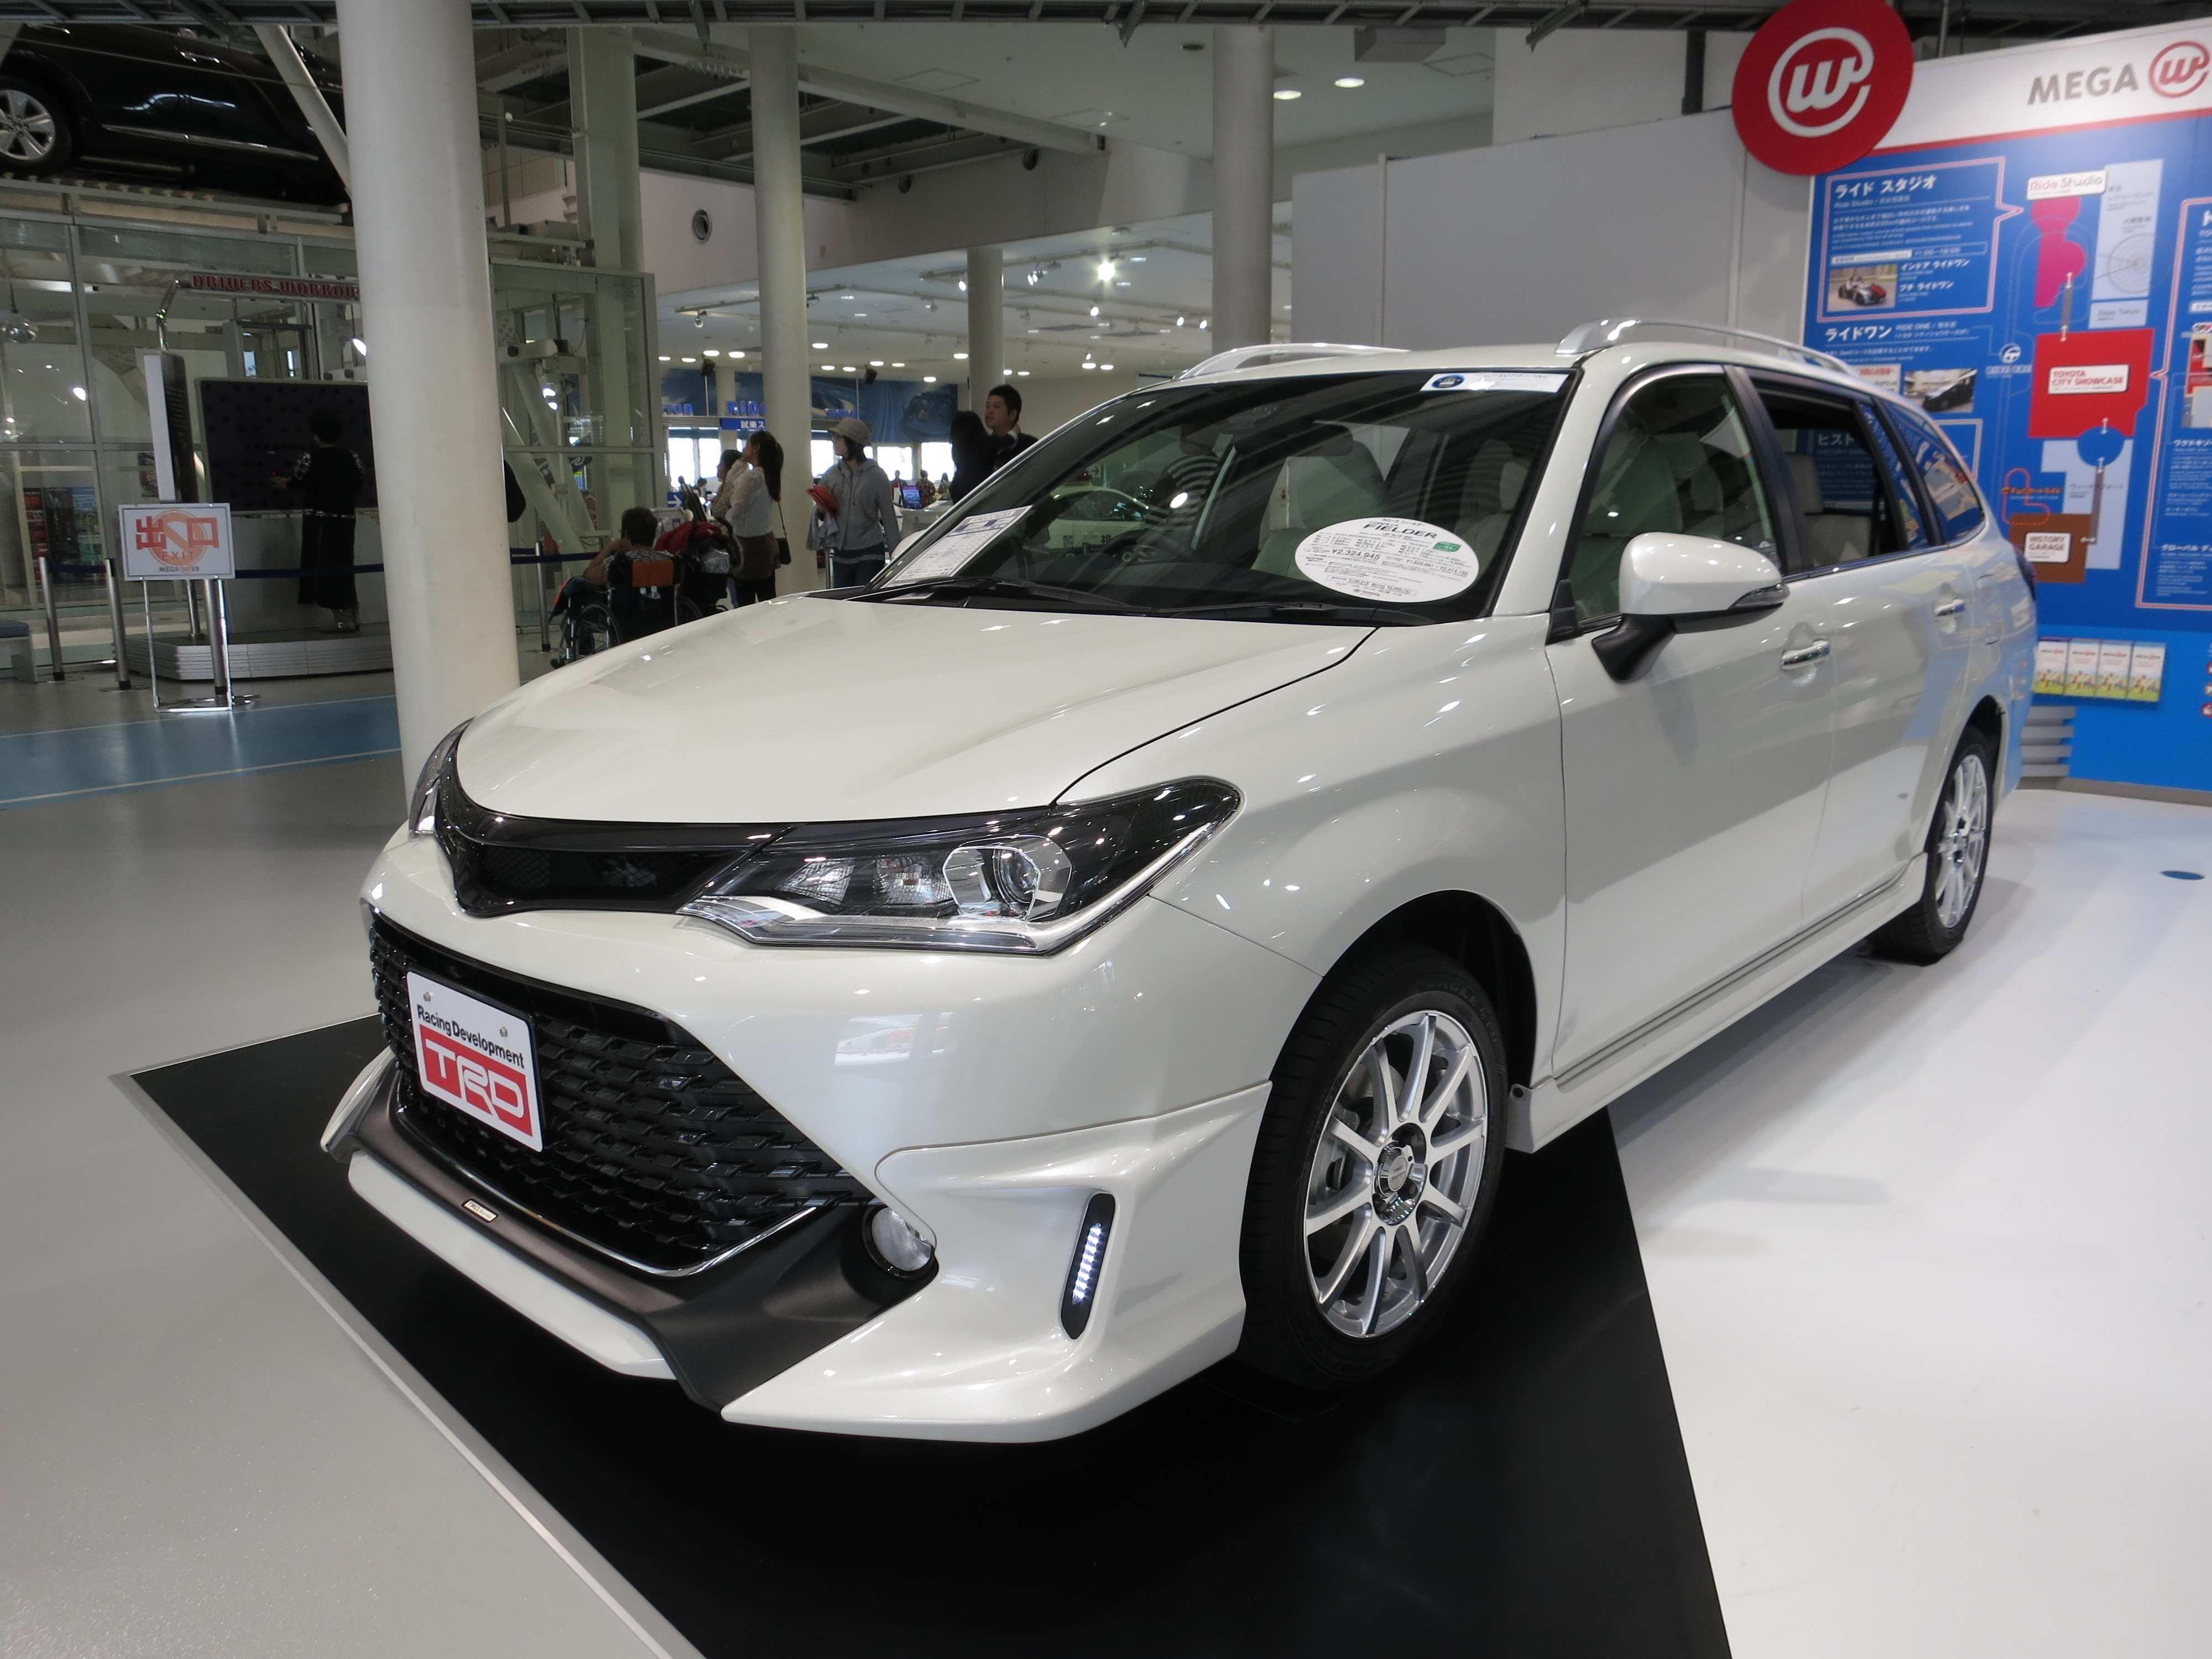 60 Gallery of Toyota Fielder 2020 Review for Toyota Fielder 2020